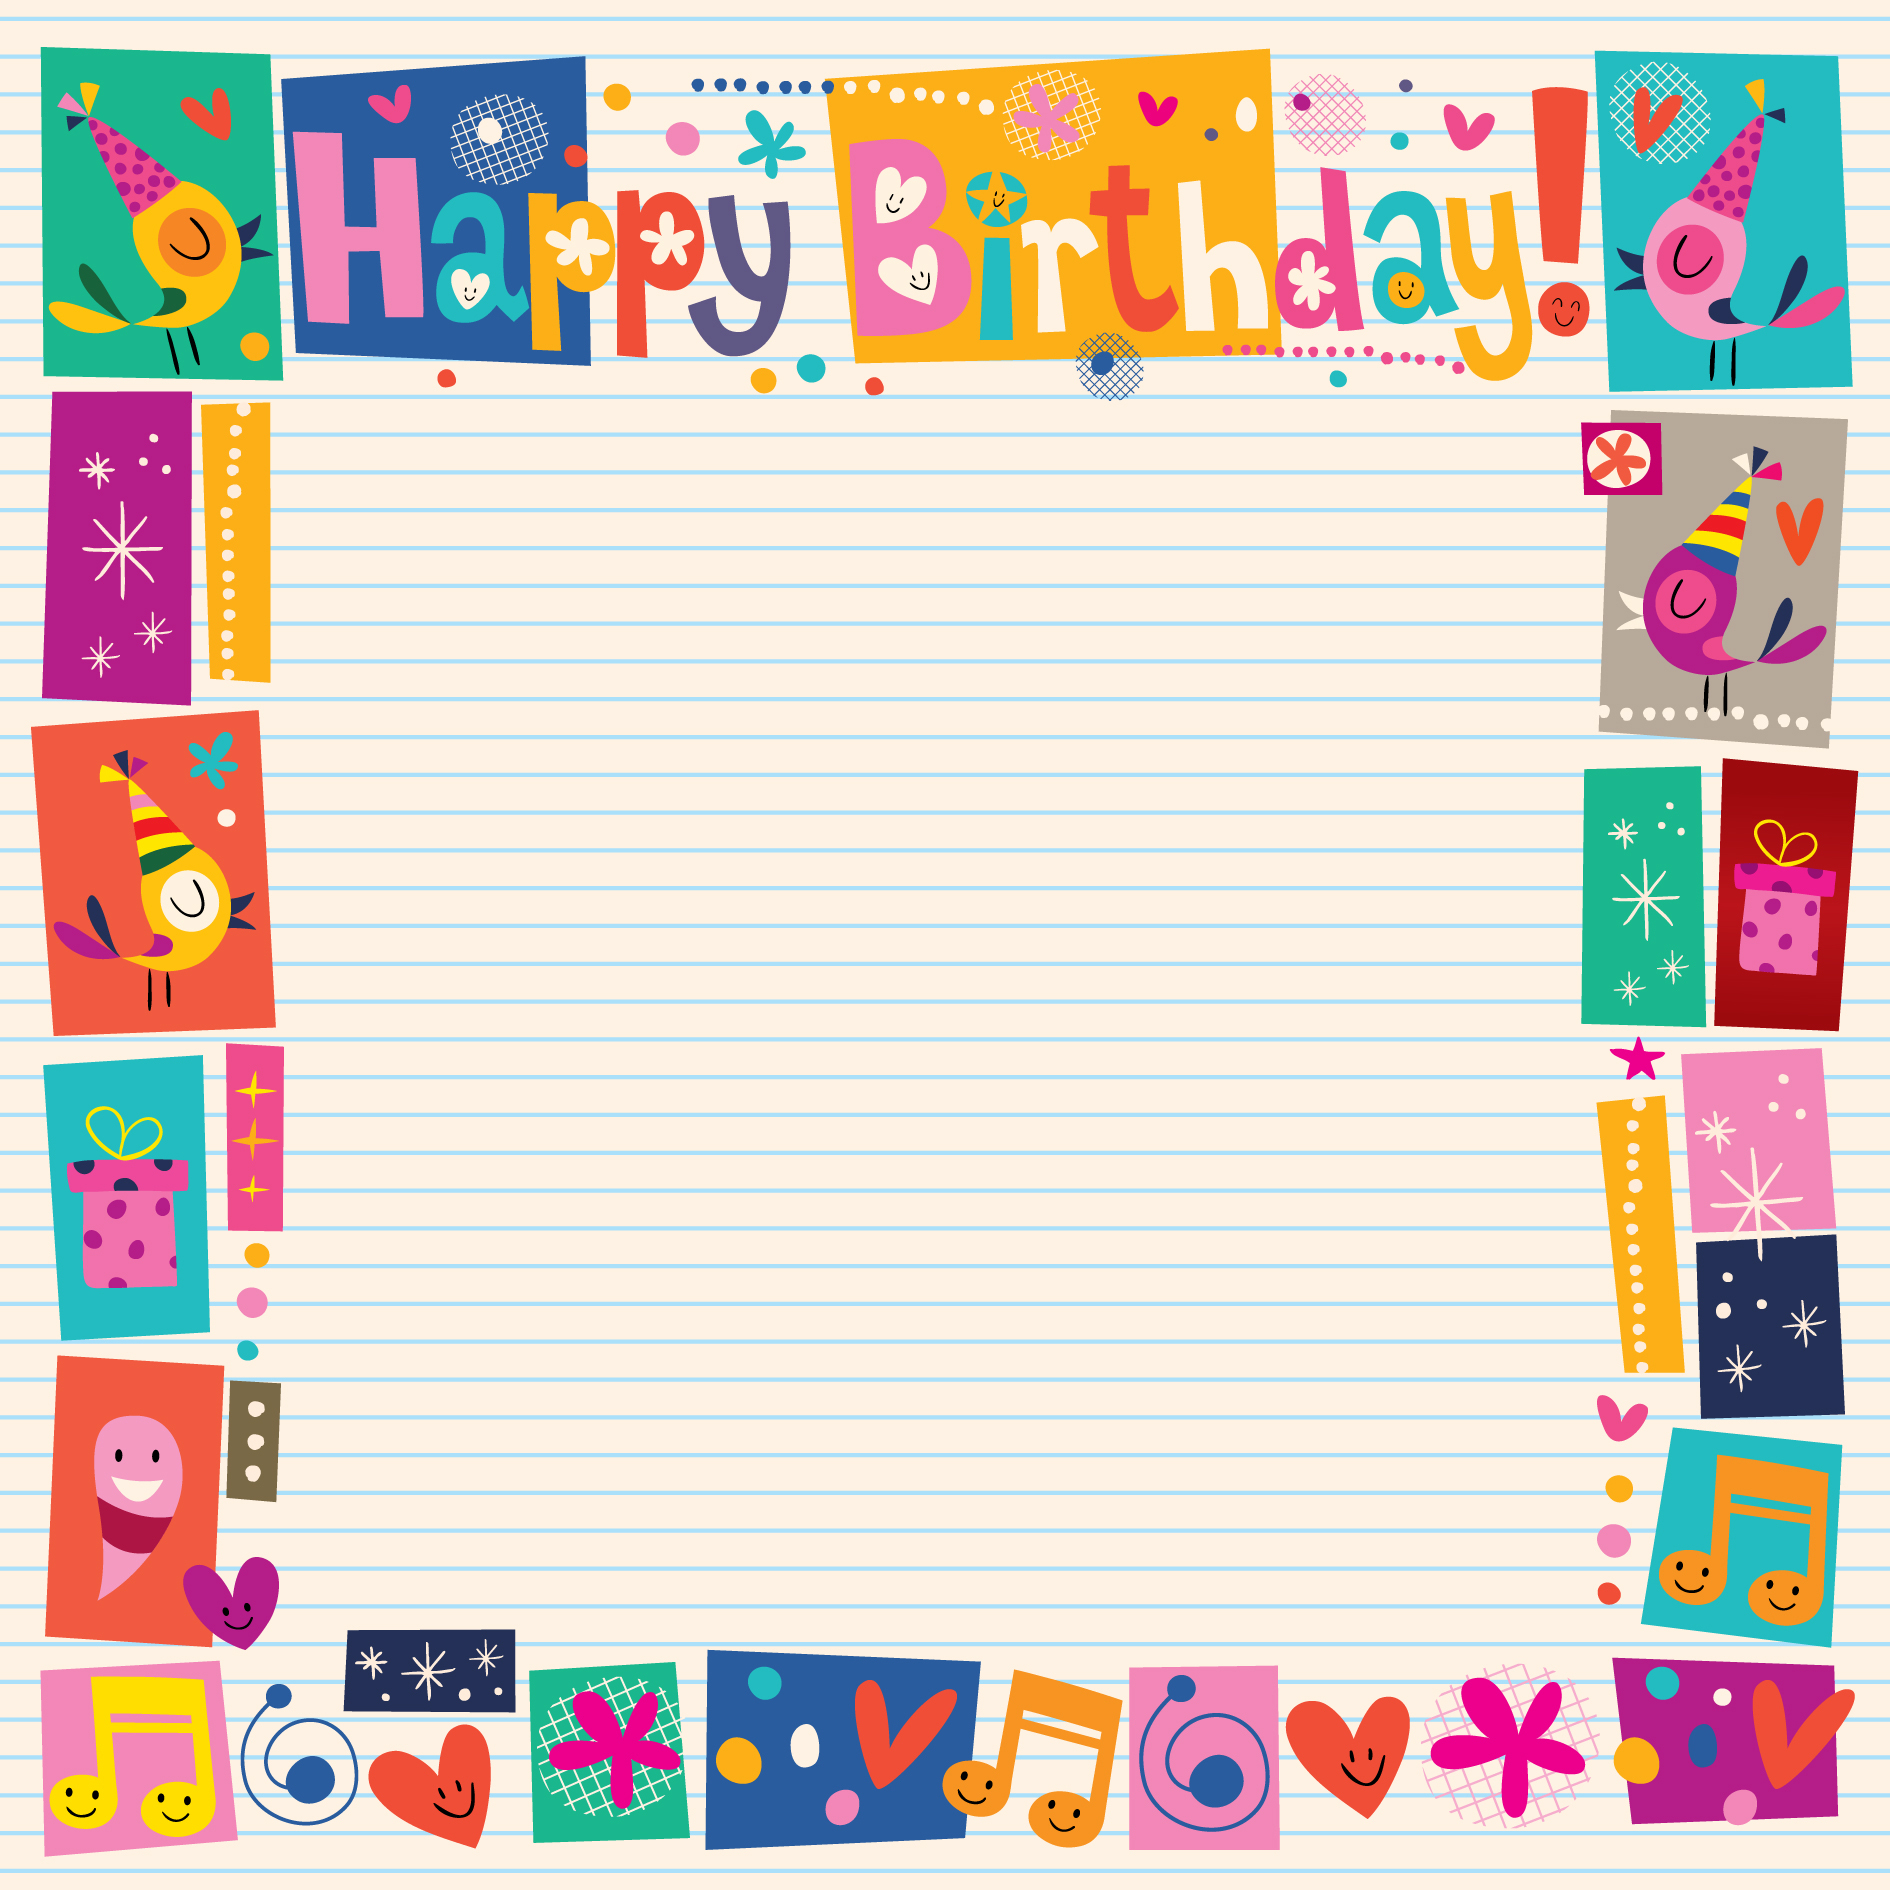 Birthday Frame Free Vector Art  7105 Free Downloads